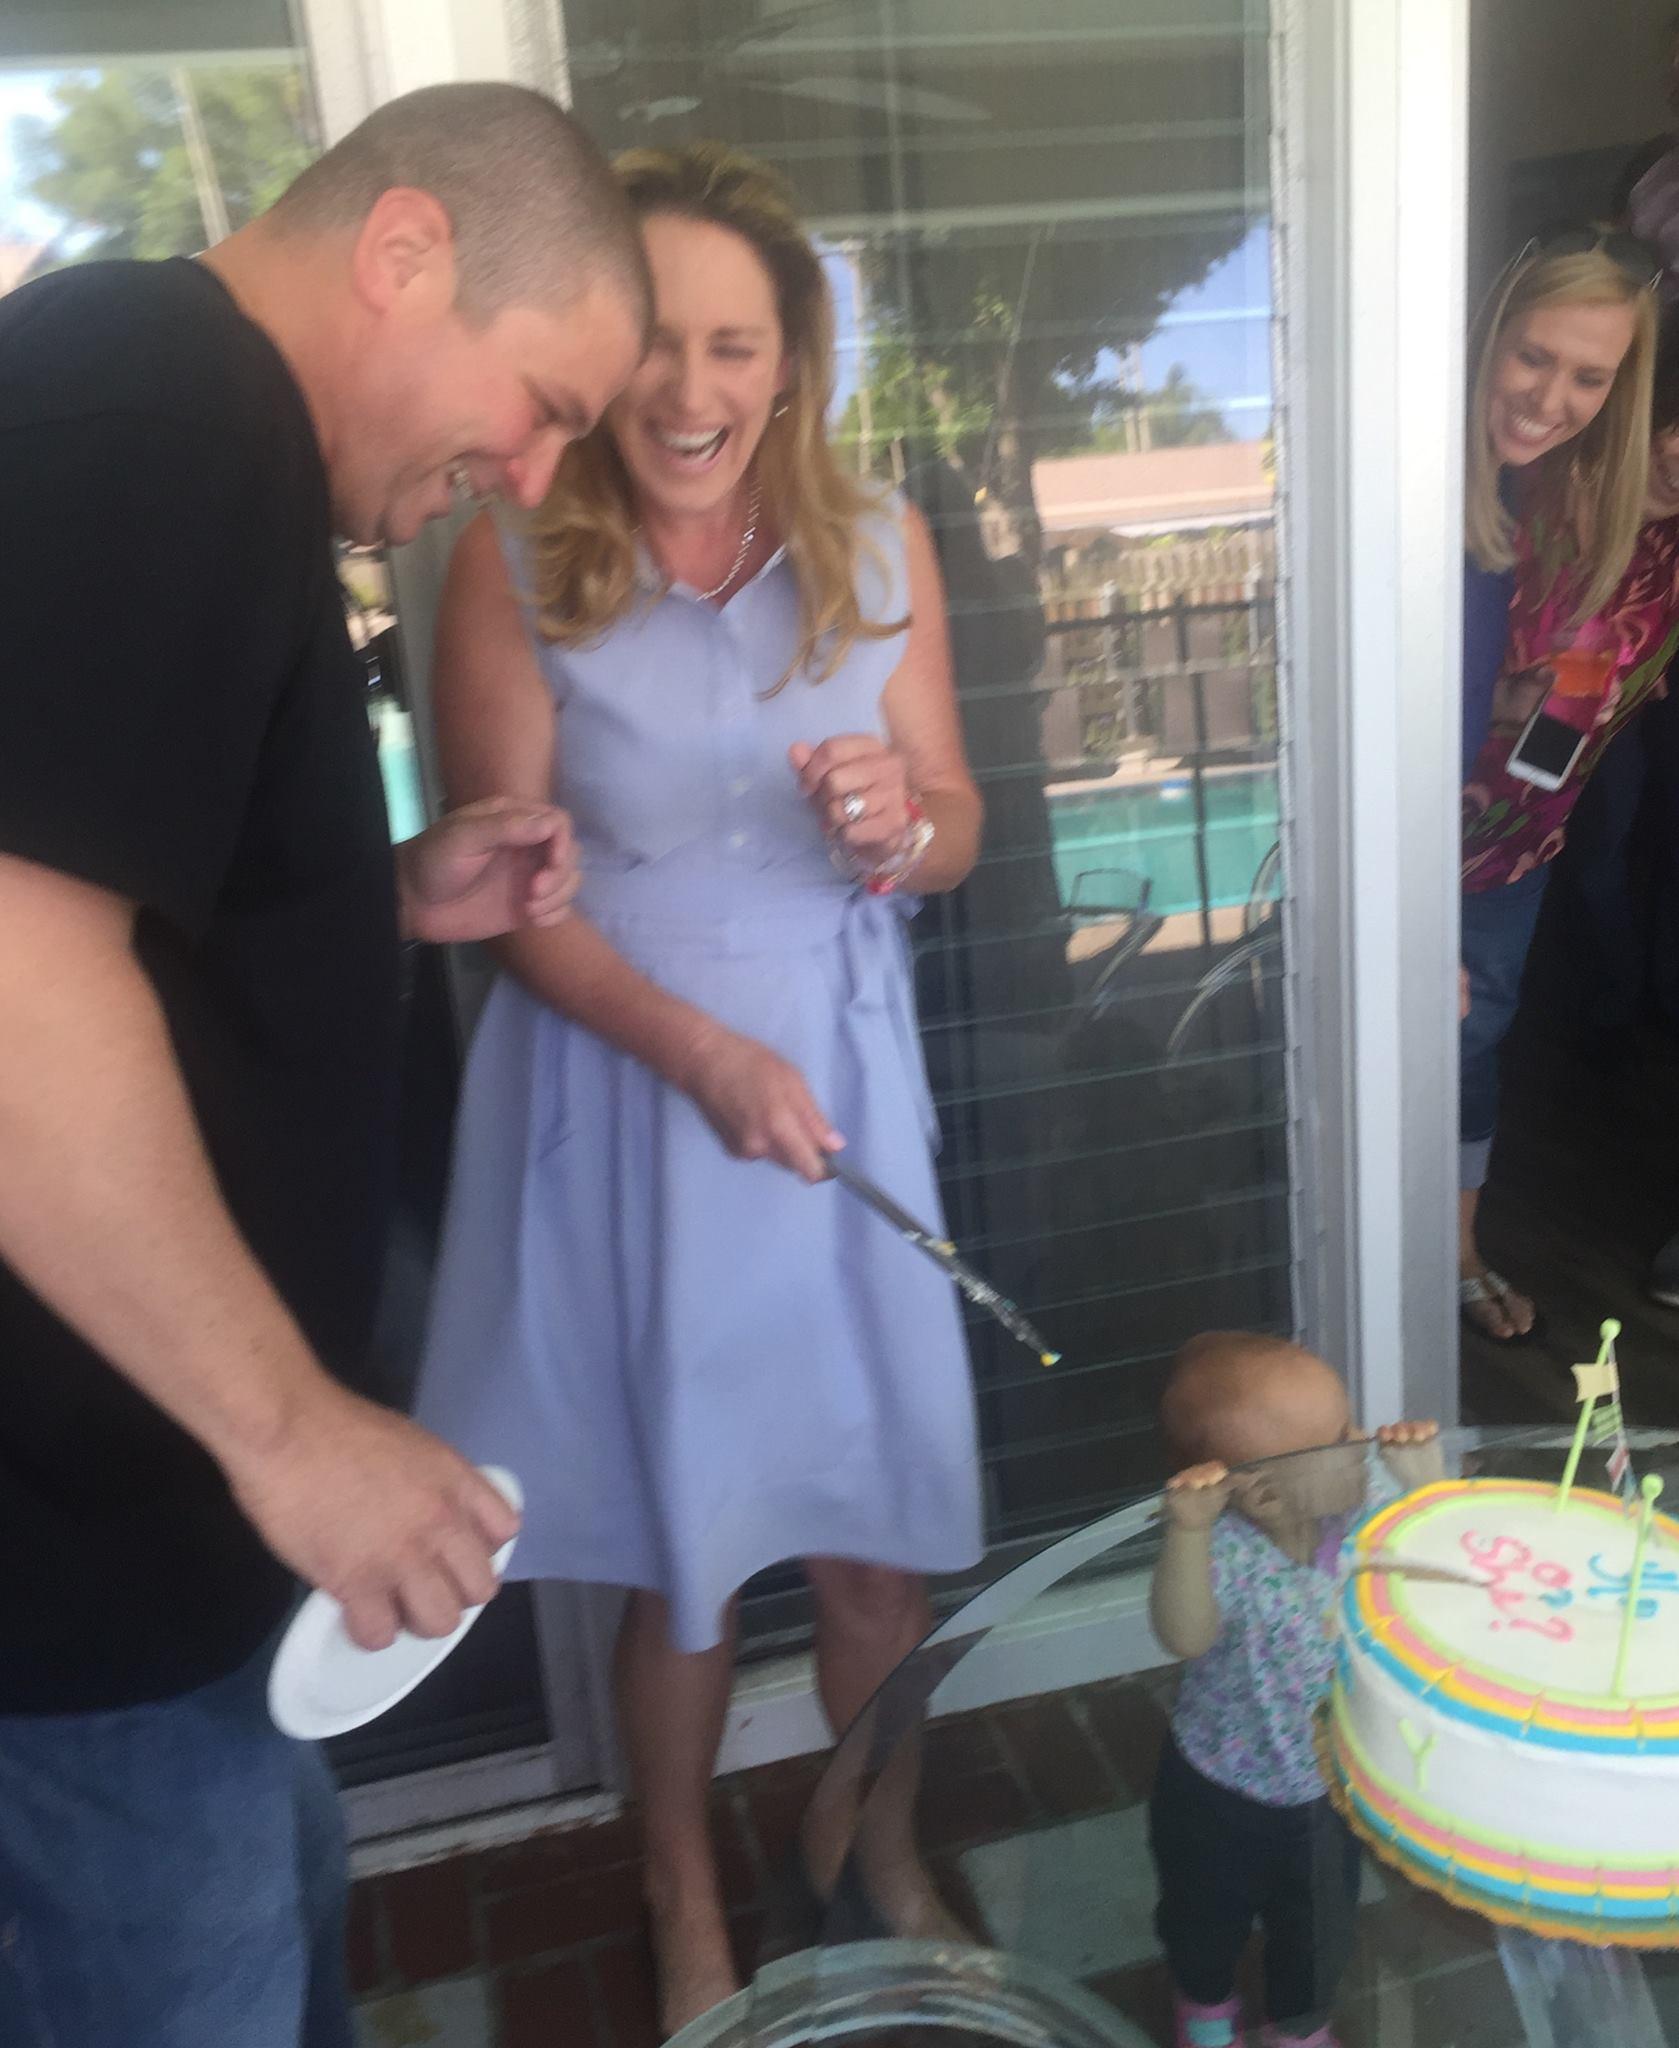 The Pregnancy Announcement